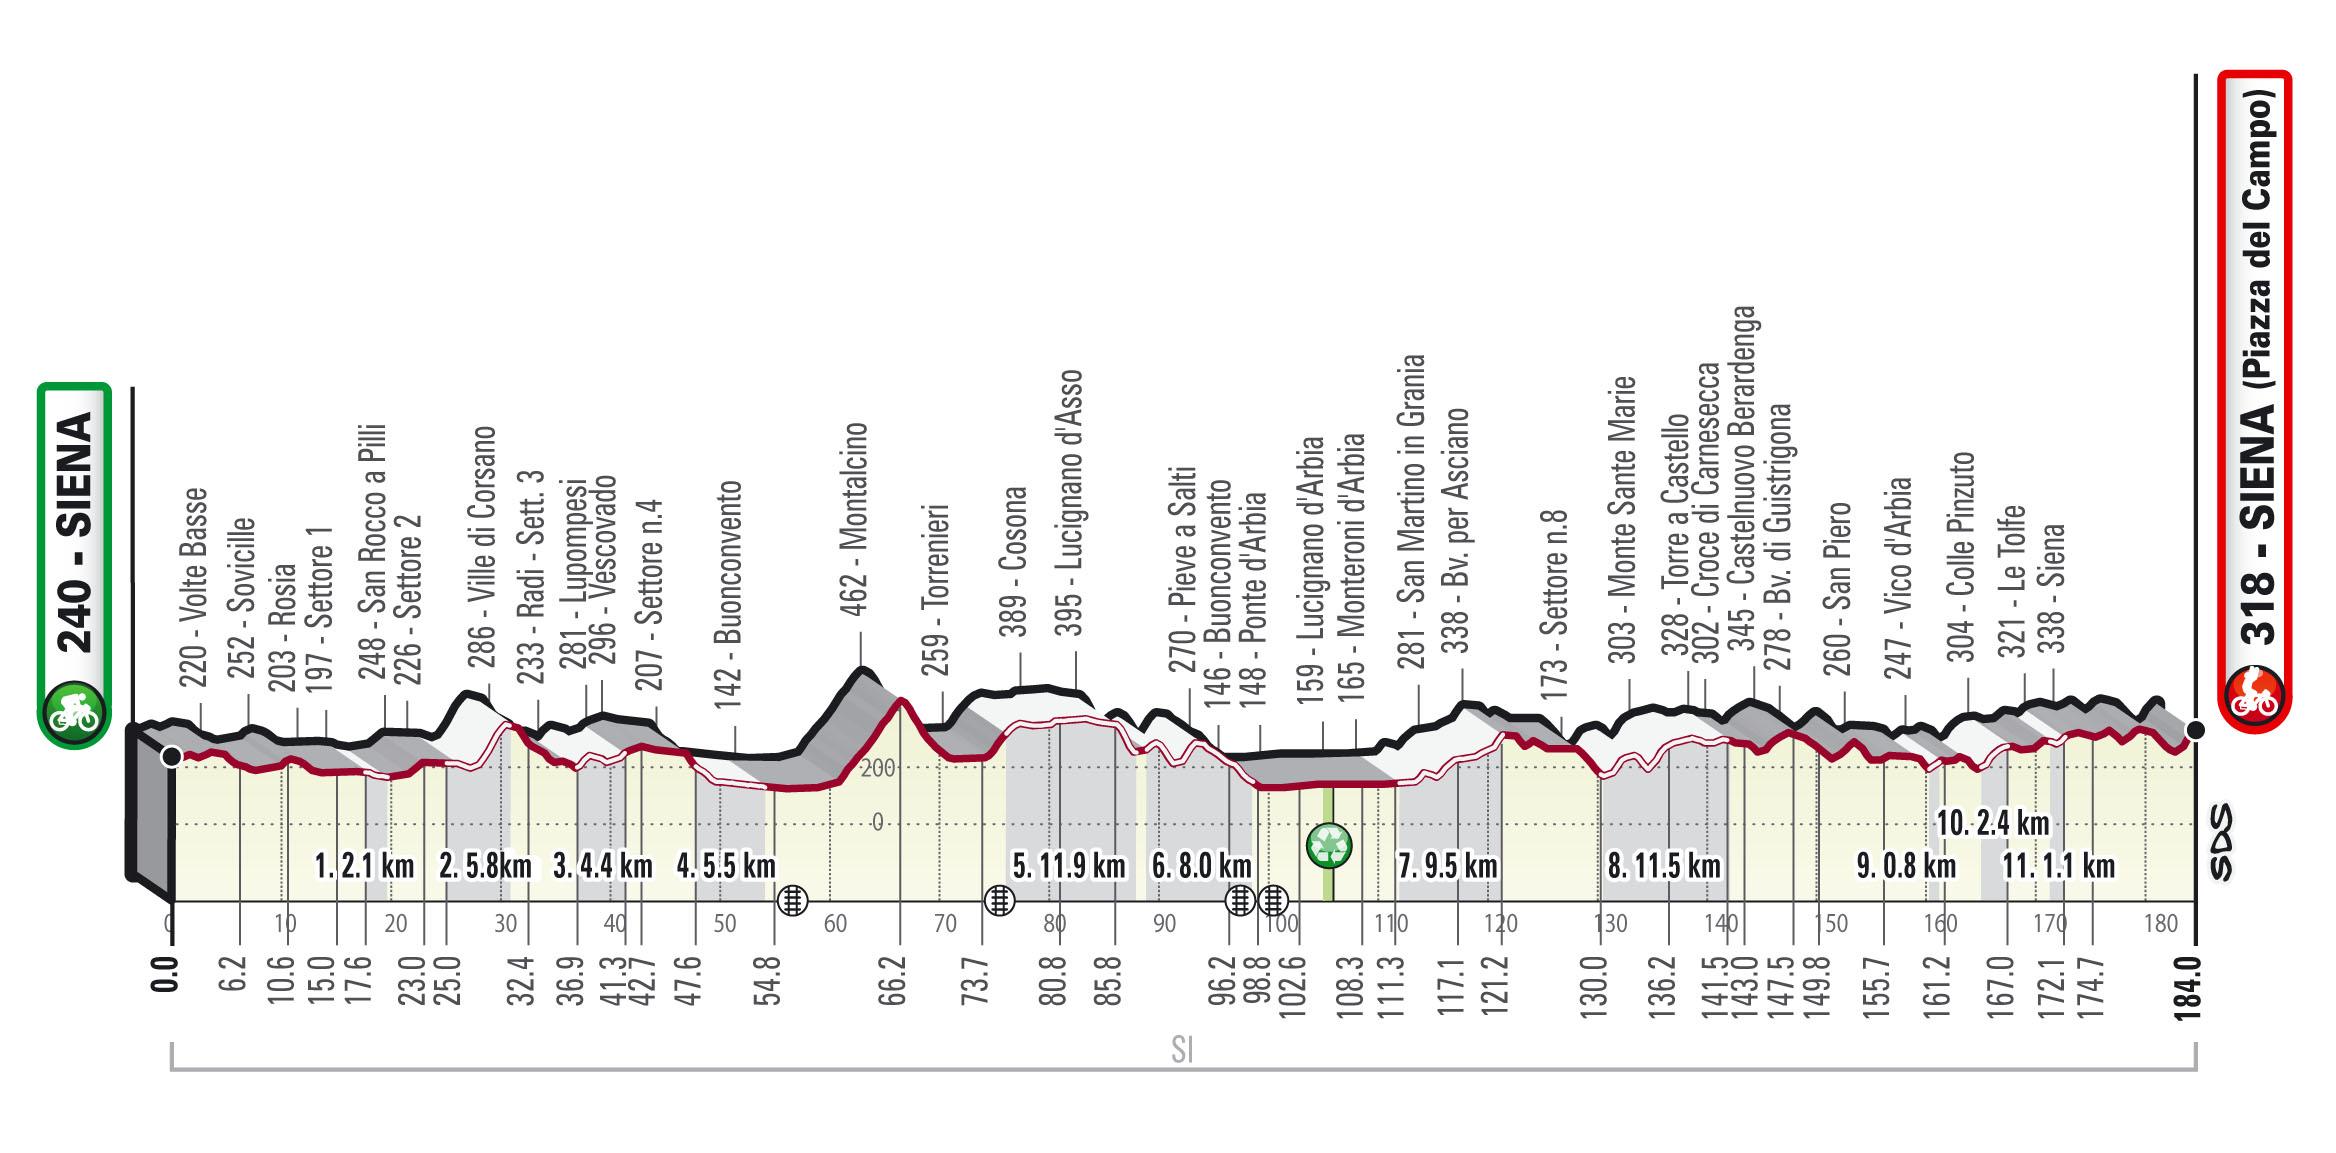 Siena – Siena. 184 kilómetros